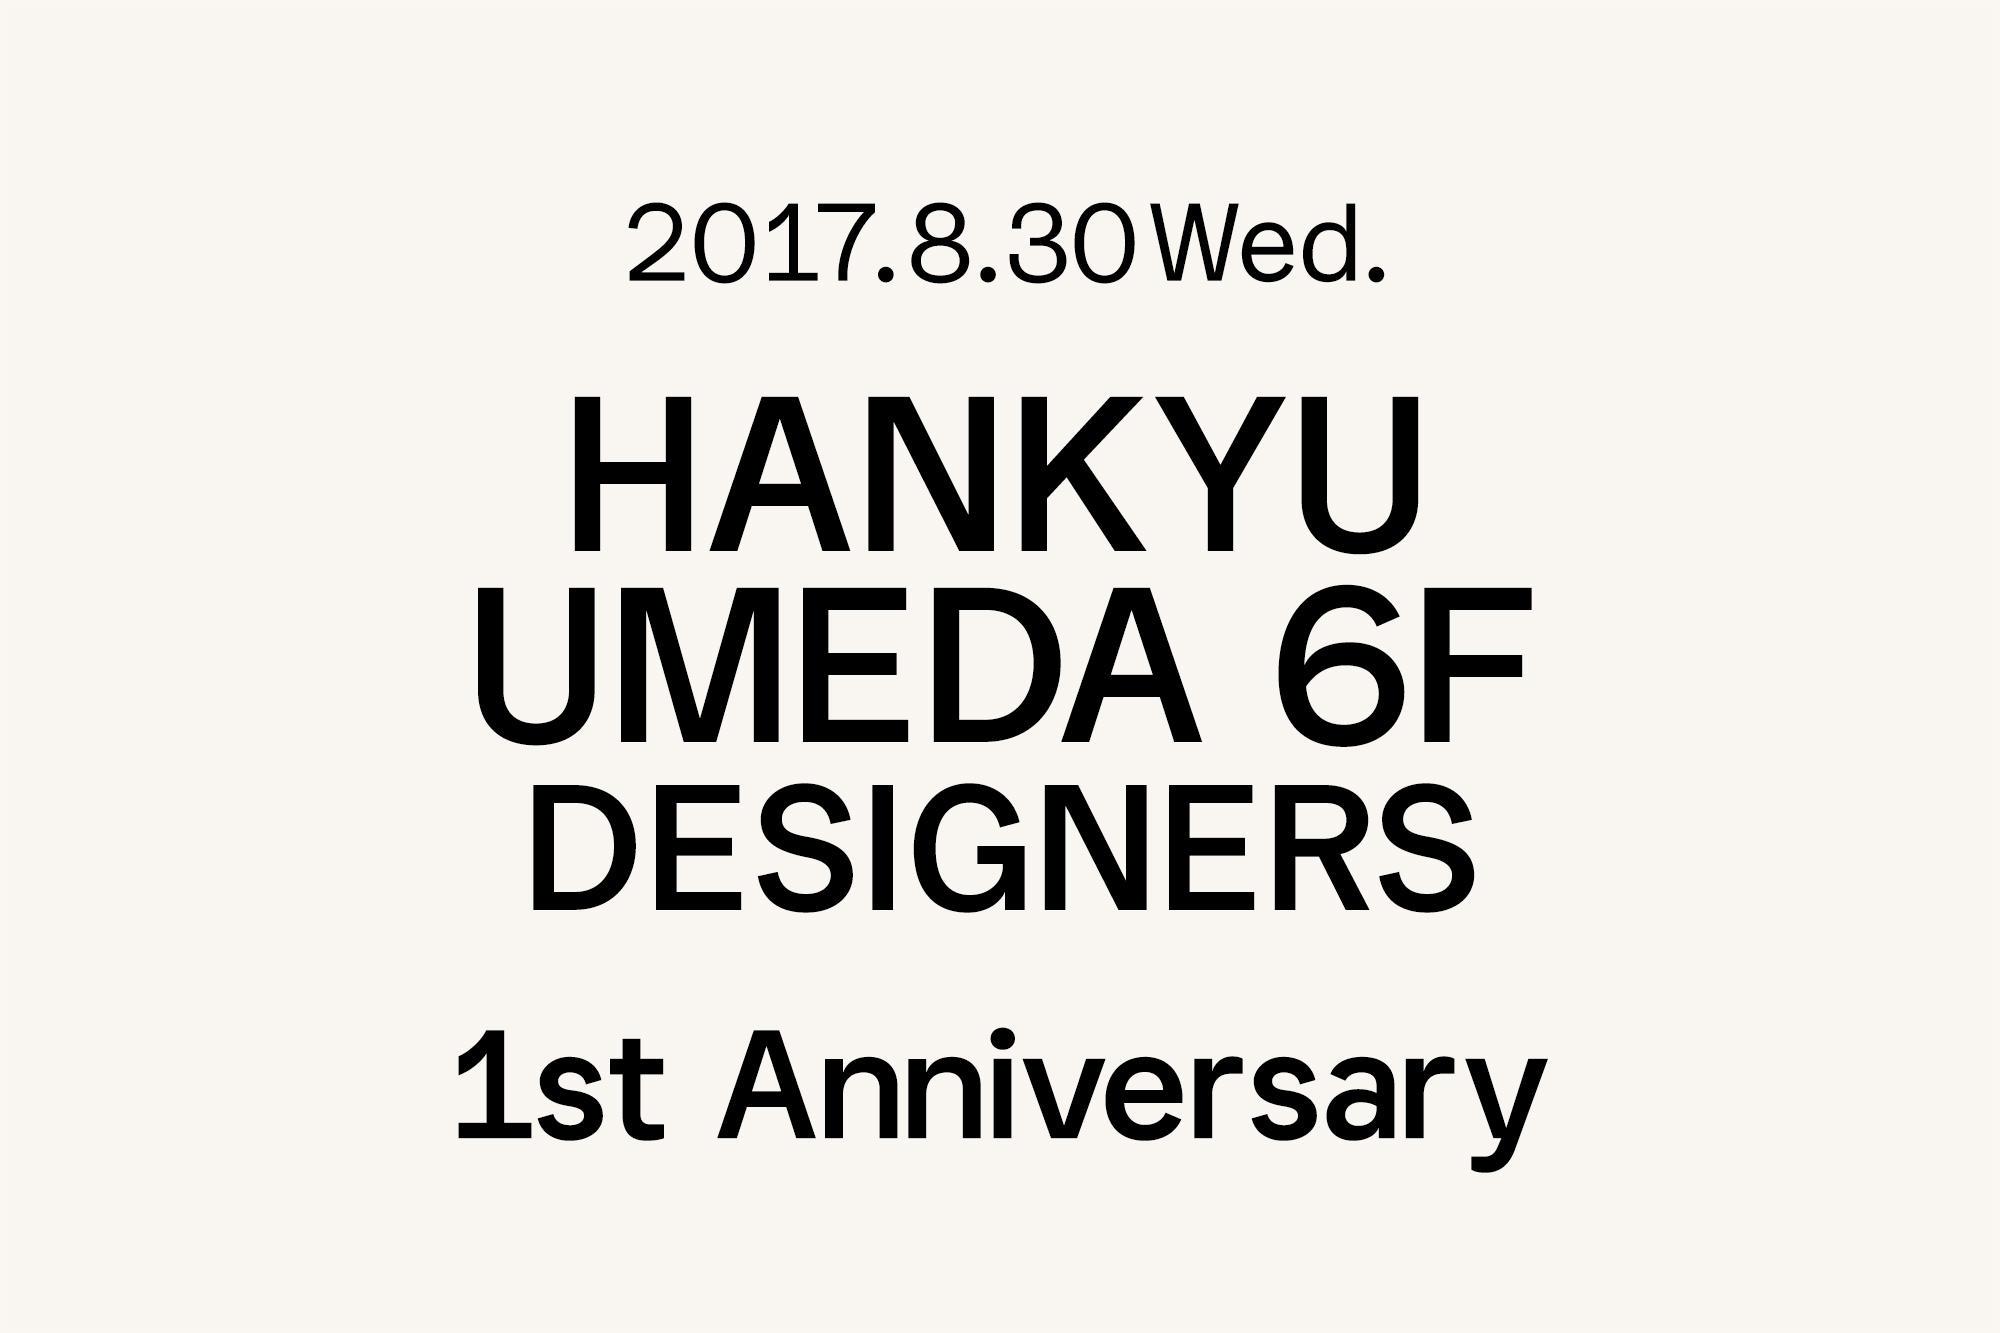 8.30- Marimekko 阪急うめだ本店 6F デザイナーズ 〜1周年〜